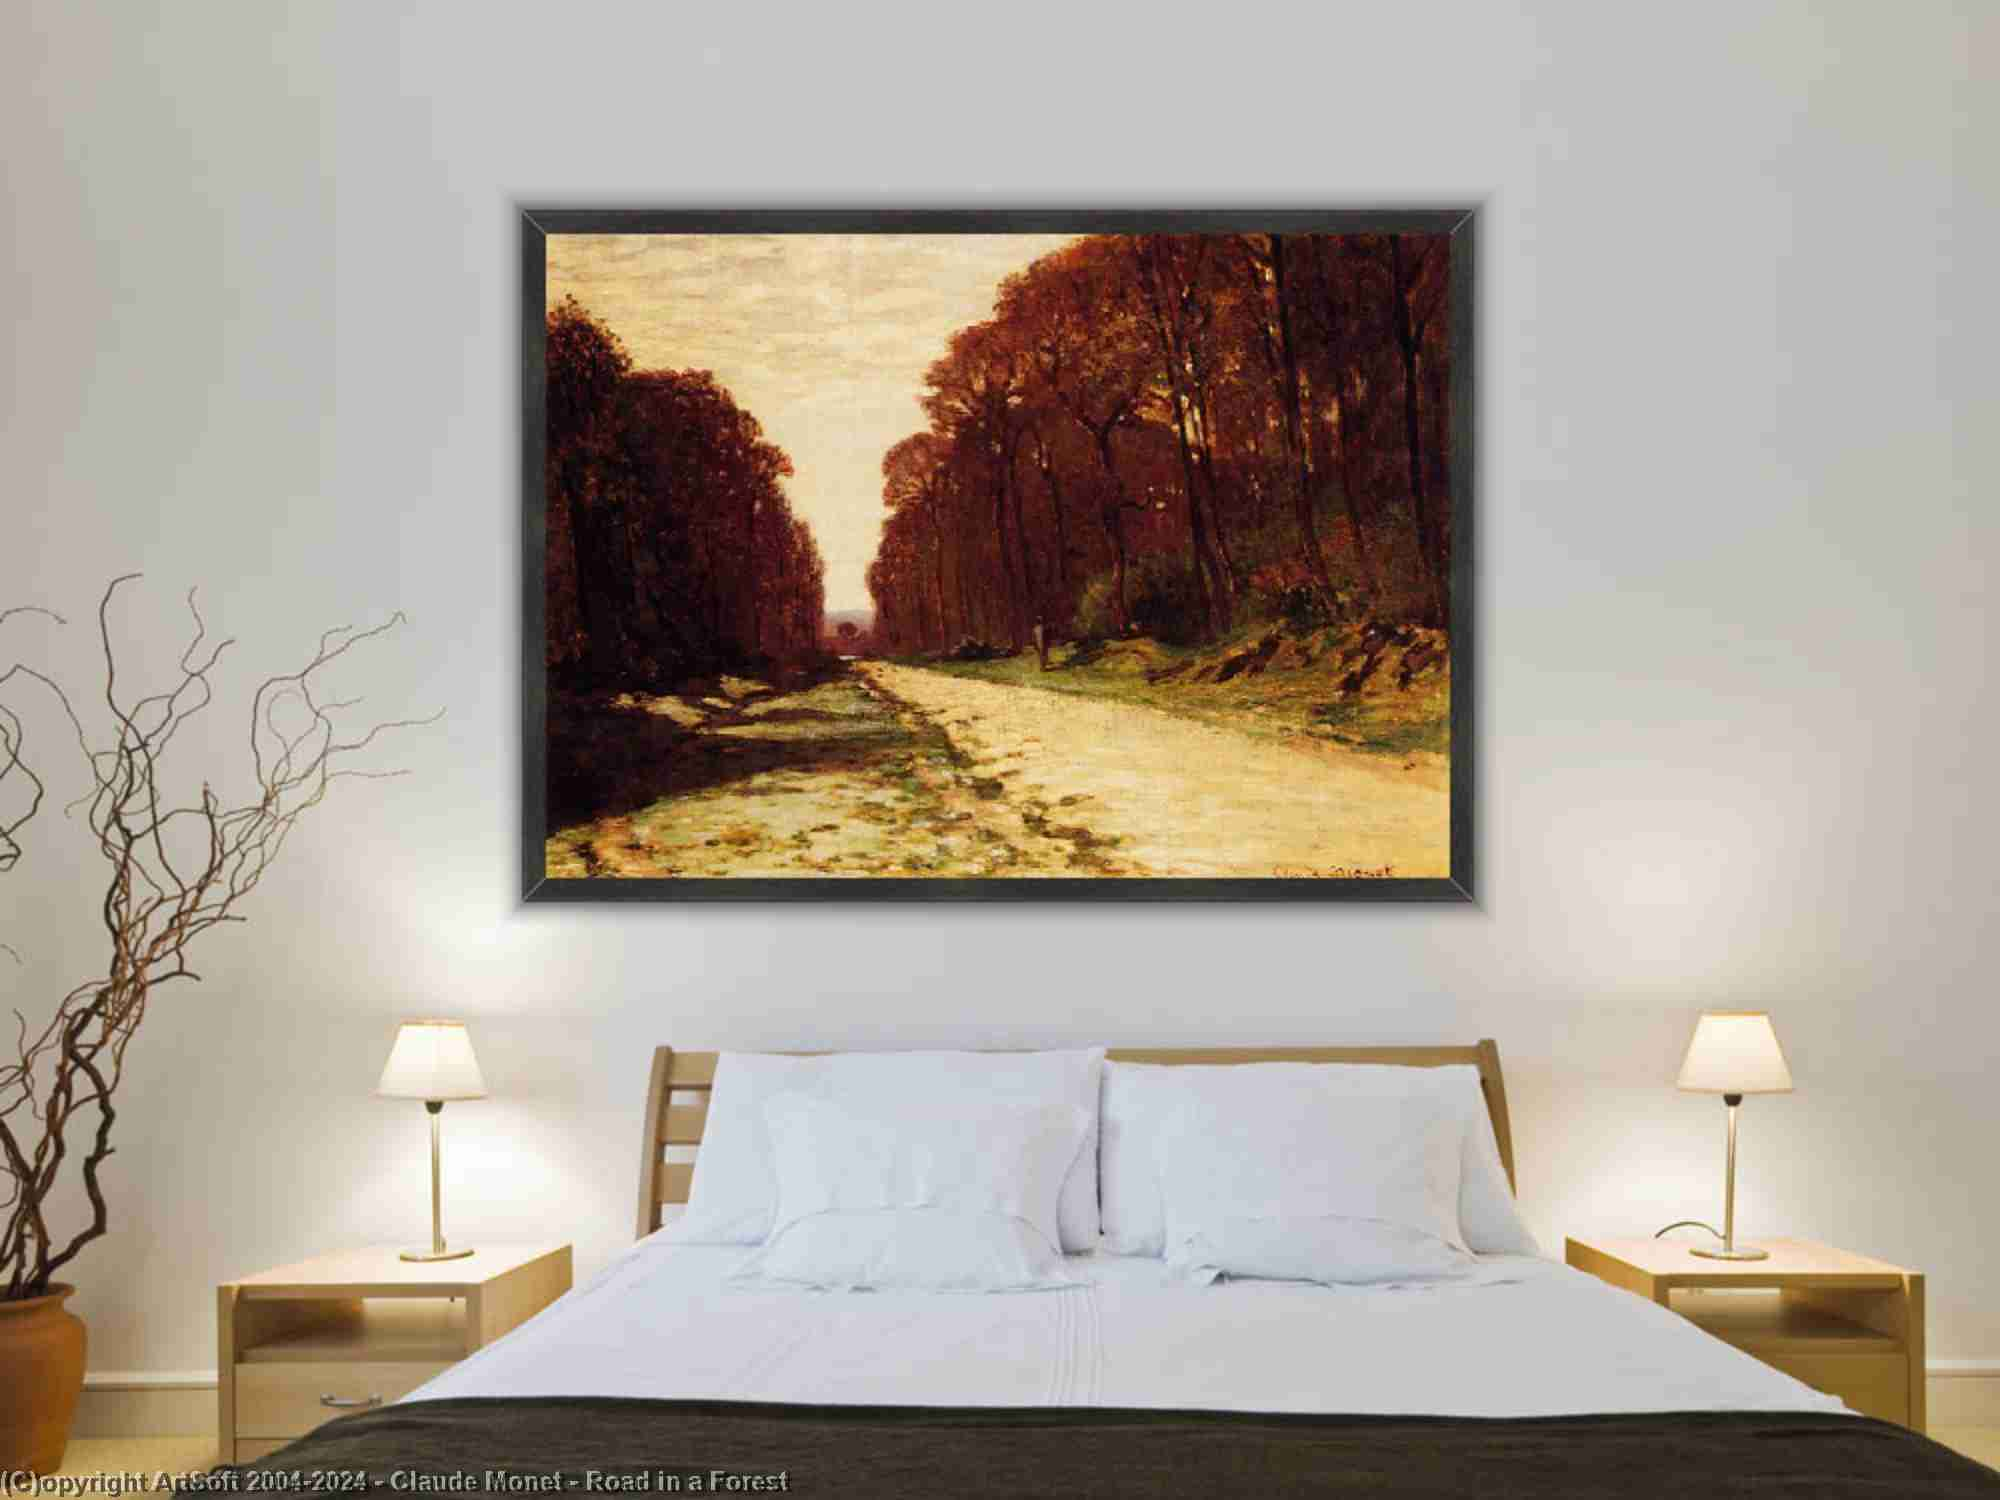 Claude Monet - strada in un foresta